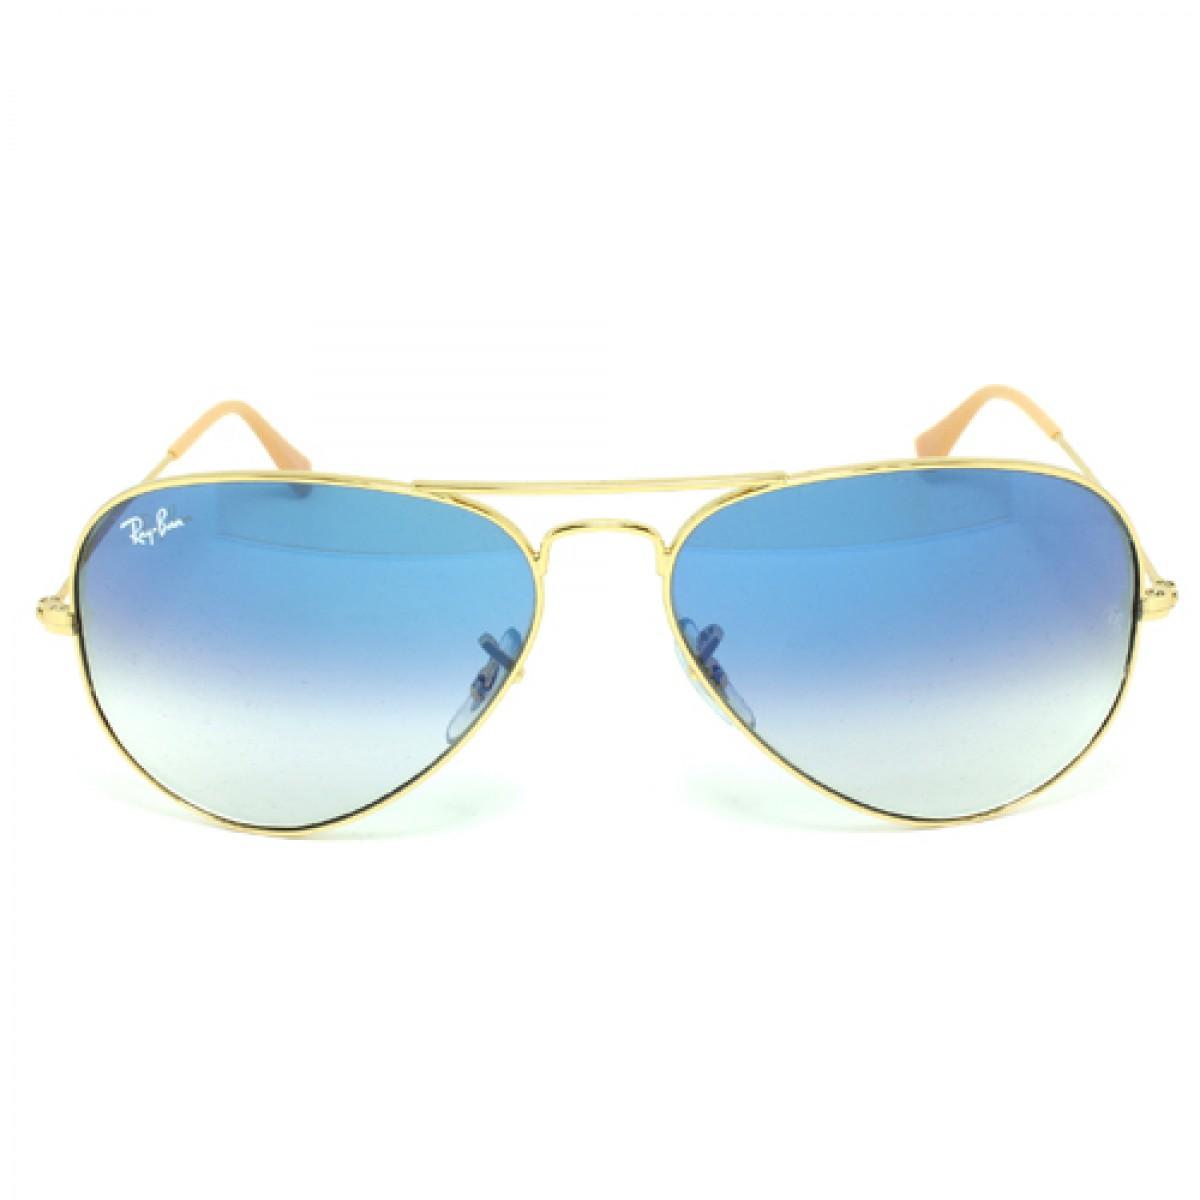 dcf22c8f8806f Ray Ban Original Aviator Unisex Sunglasses RB3025-001 3F-58 ...